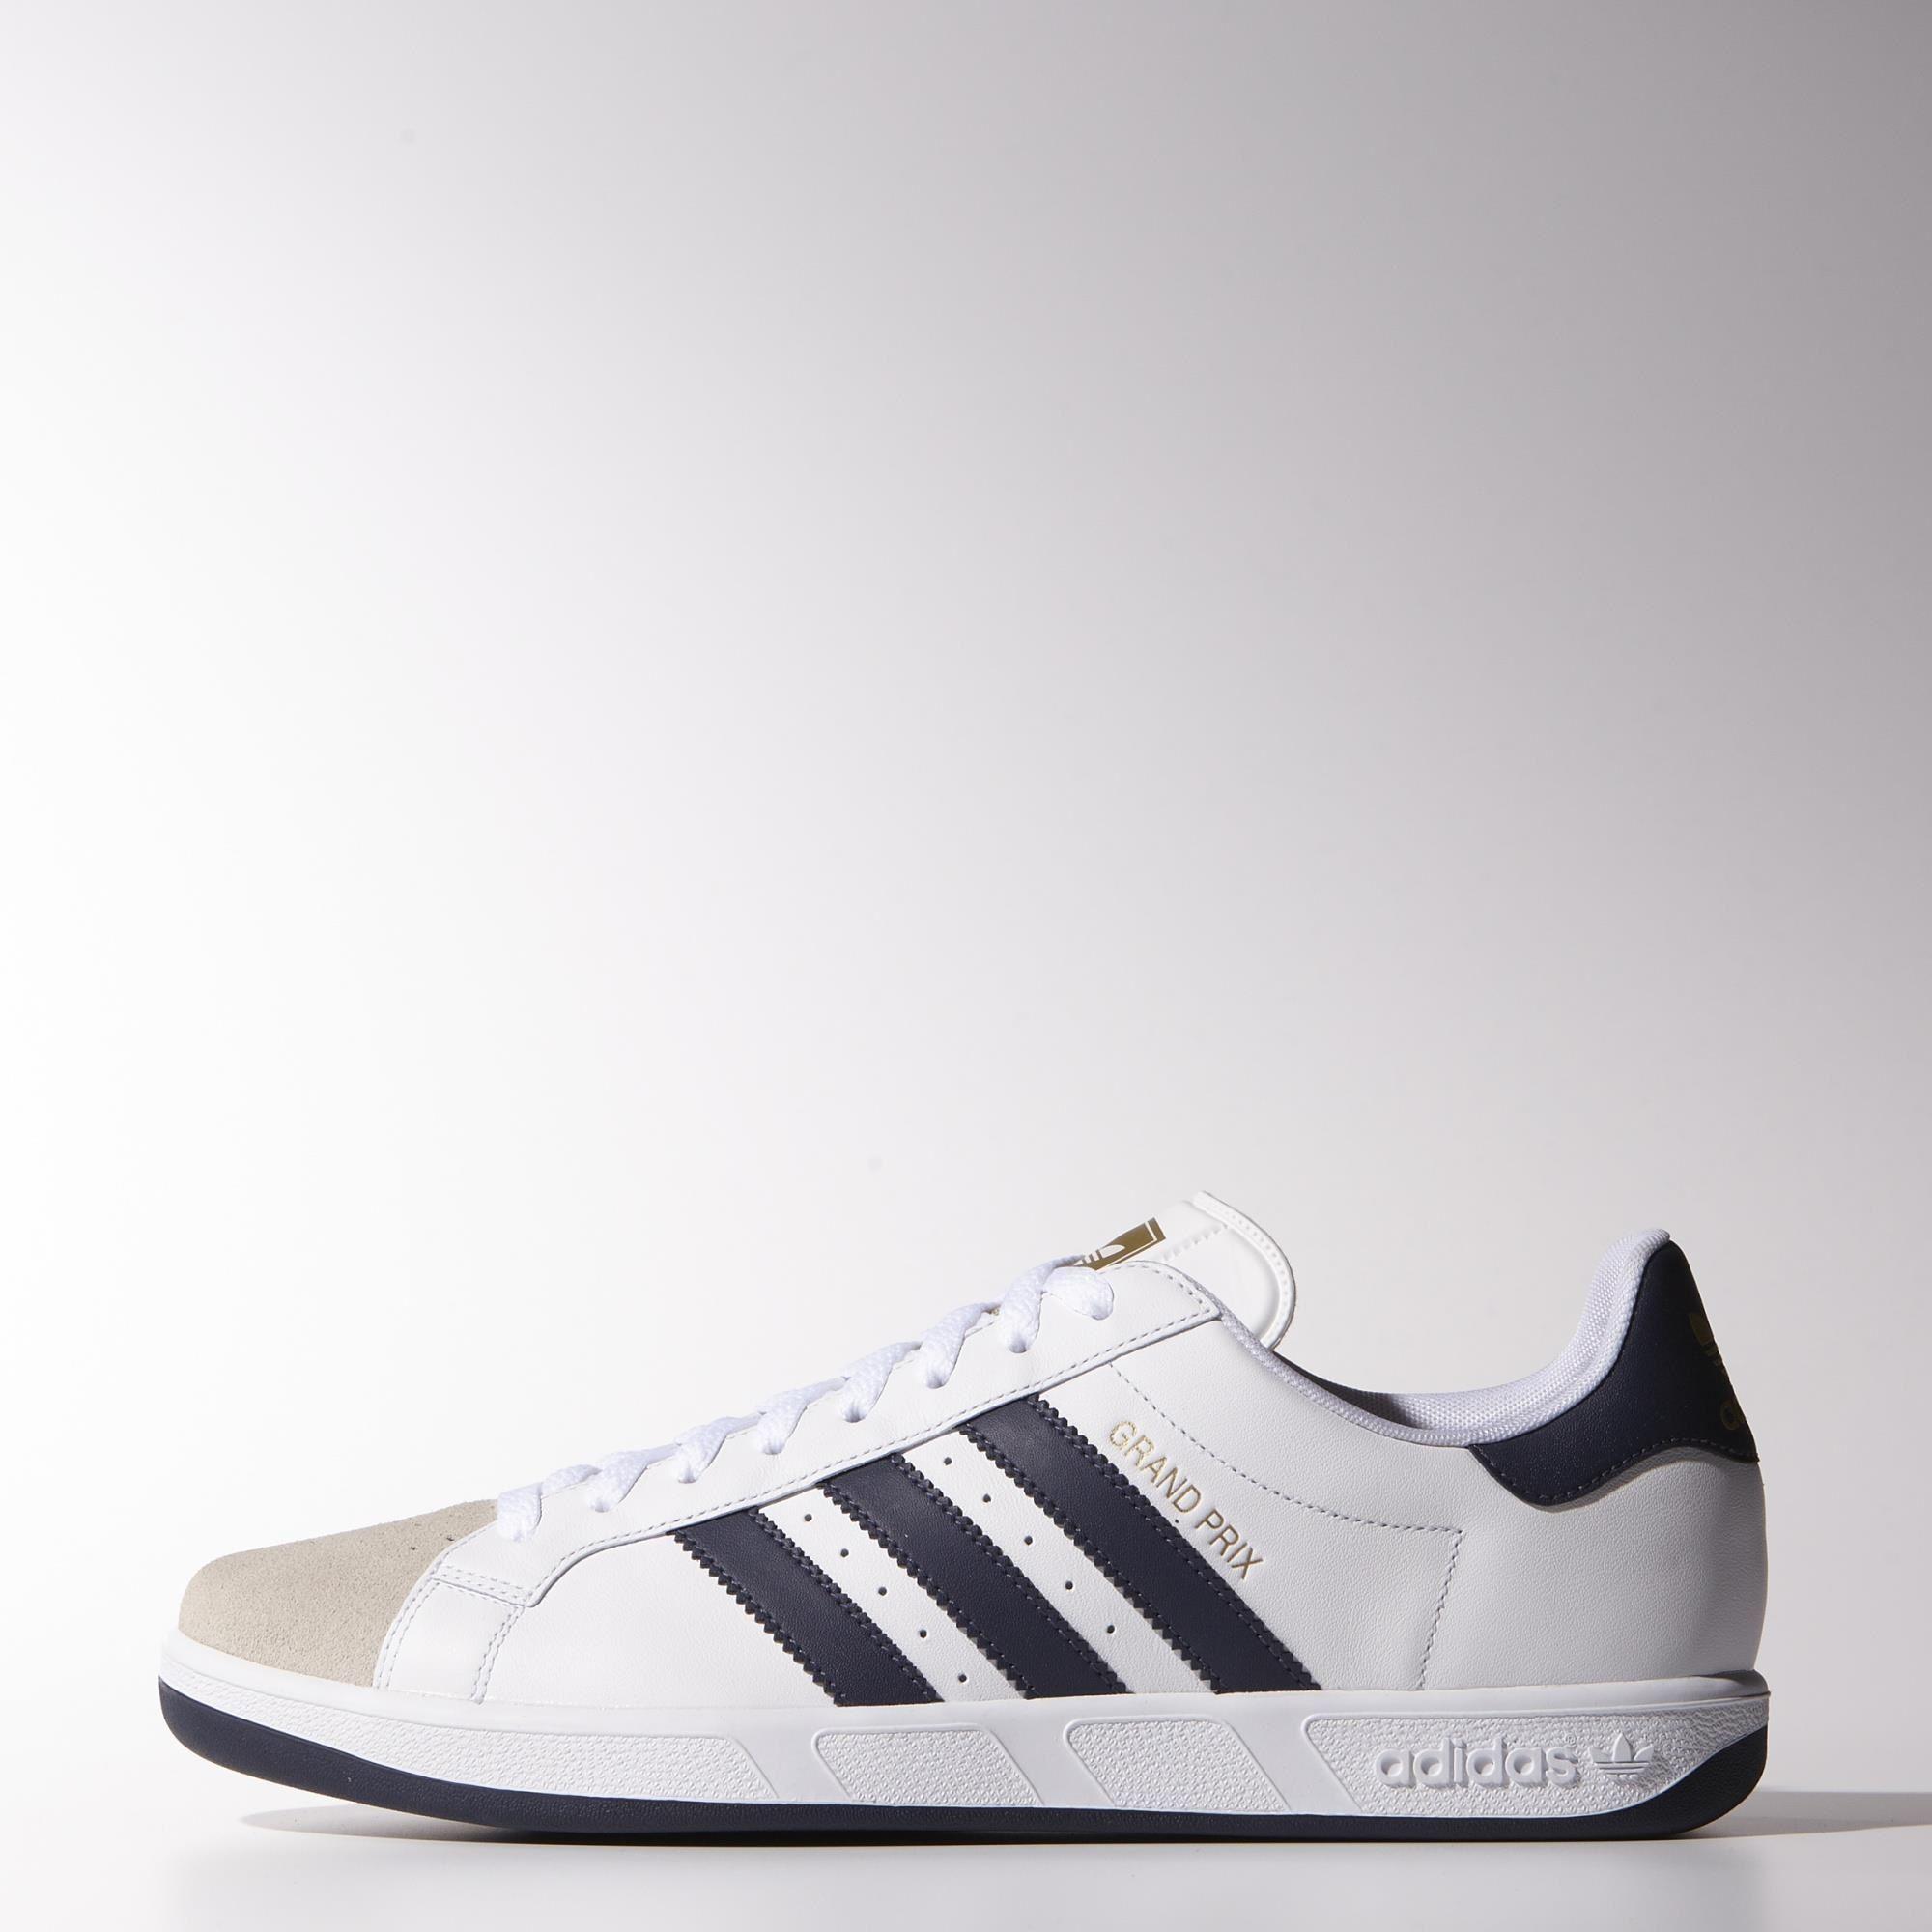 adidas Buty Grand Prix 349 Adidas, Adidas sneakers